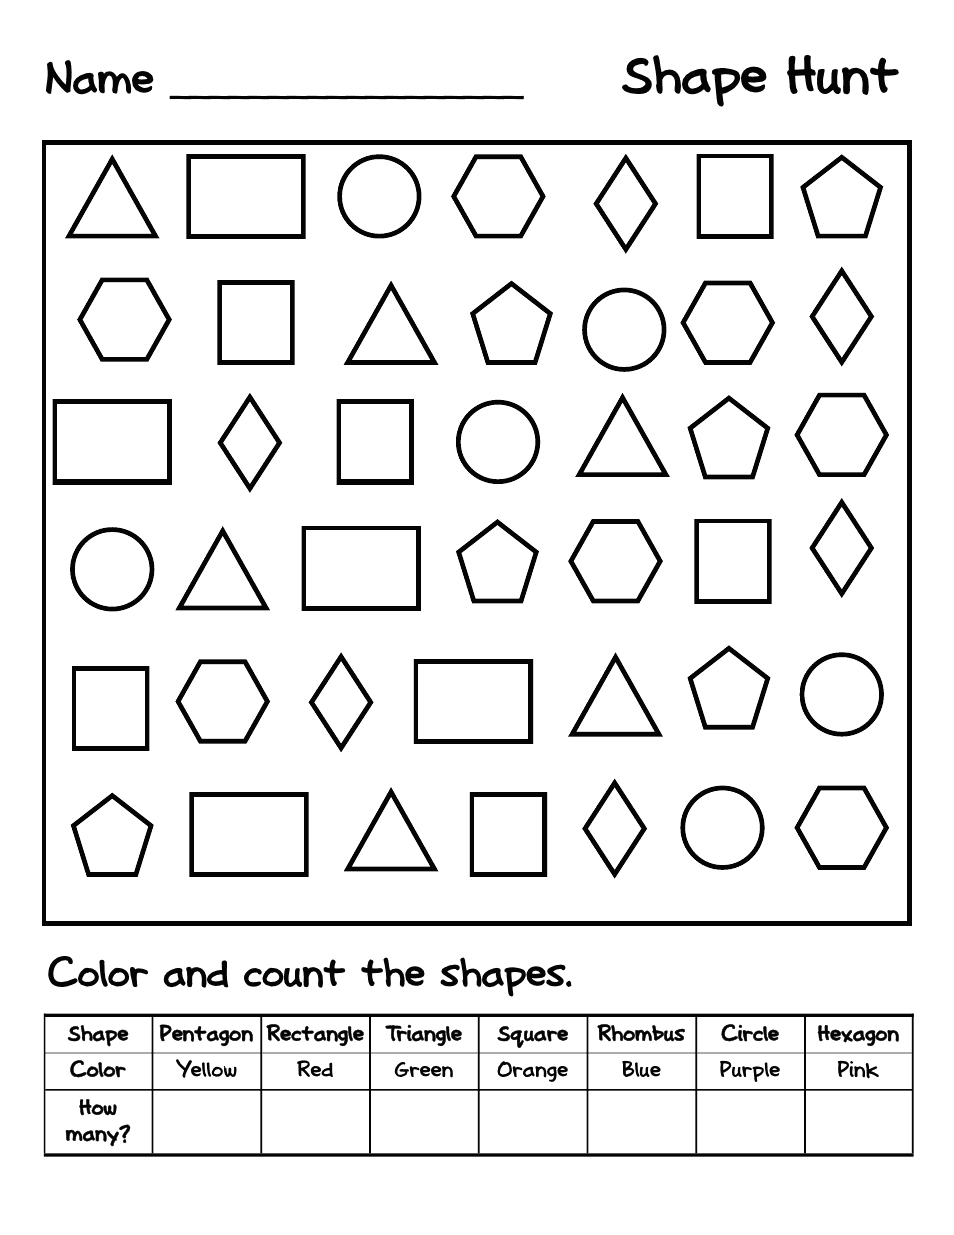 Shape Hunt.pdf   Google Drive   Shapes worksheet ...